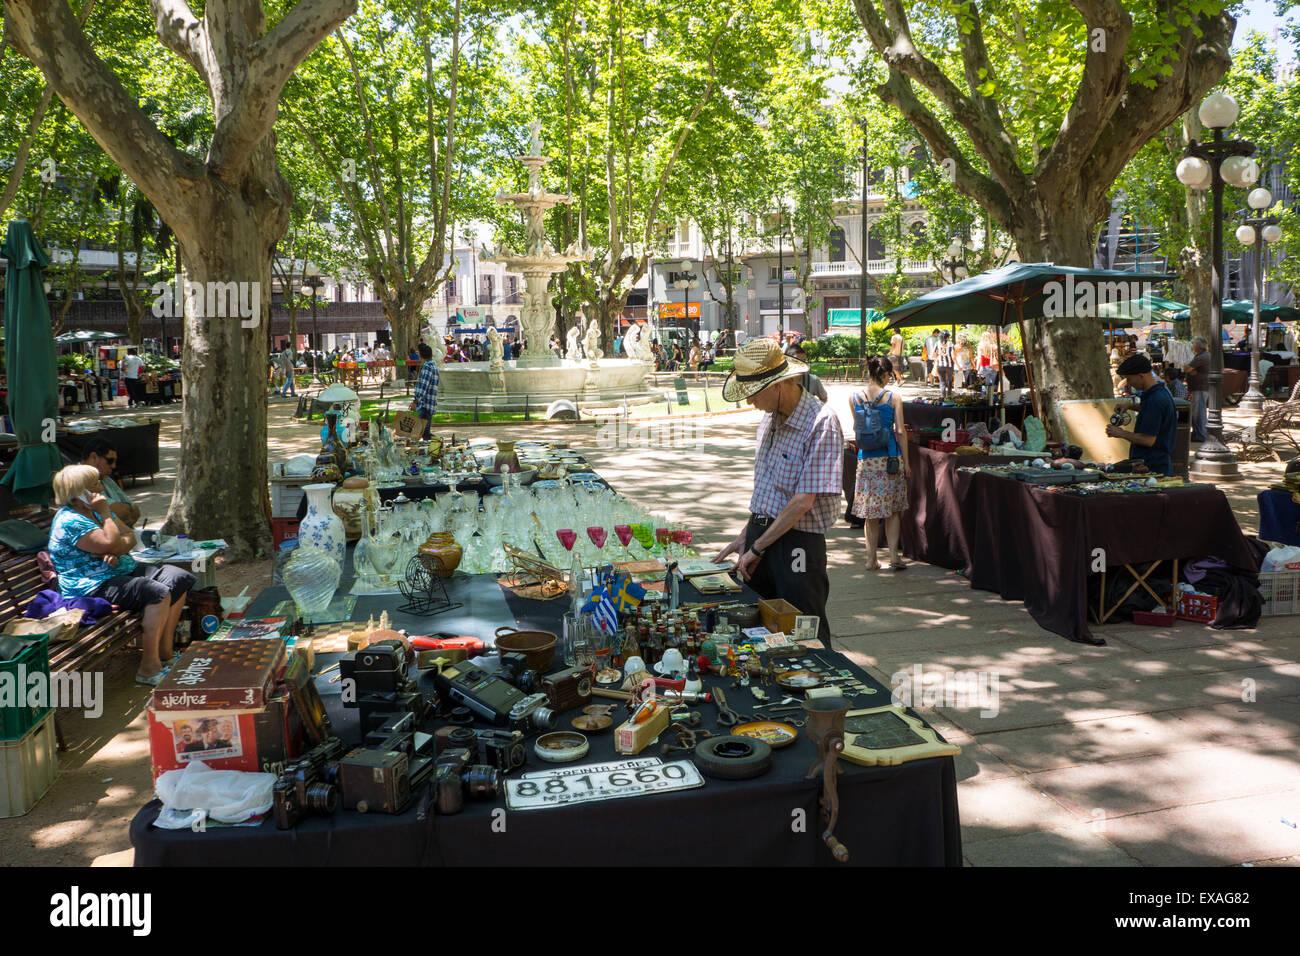 Antique market, Montevideo, Uruguay, South America - Stock Image